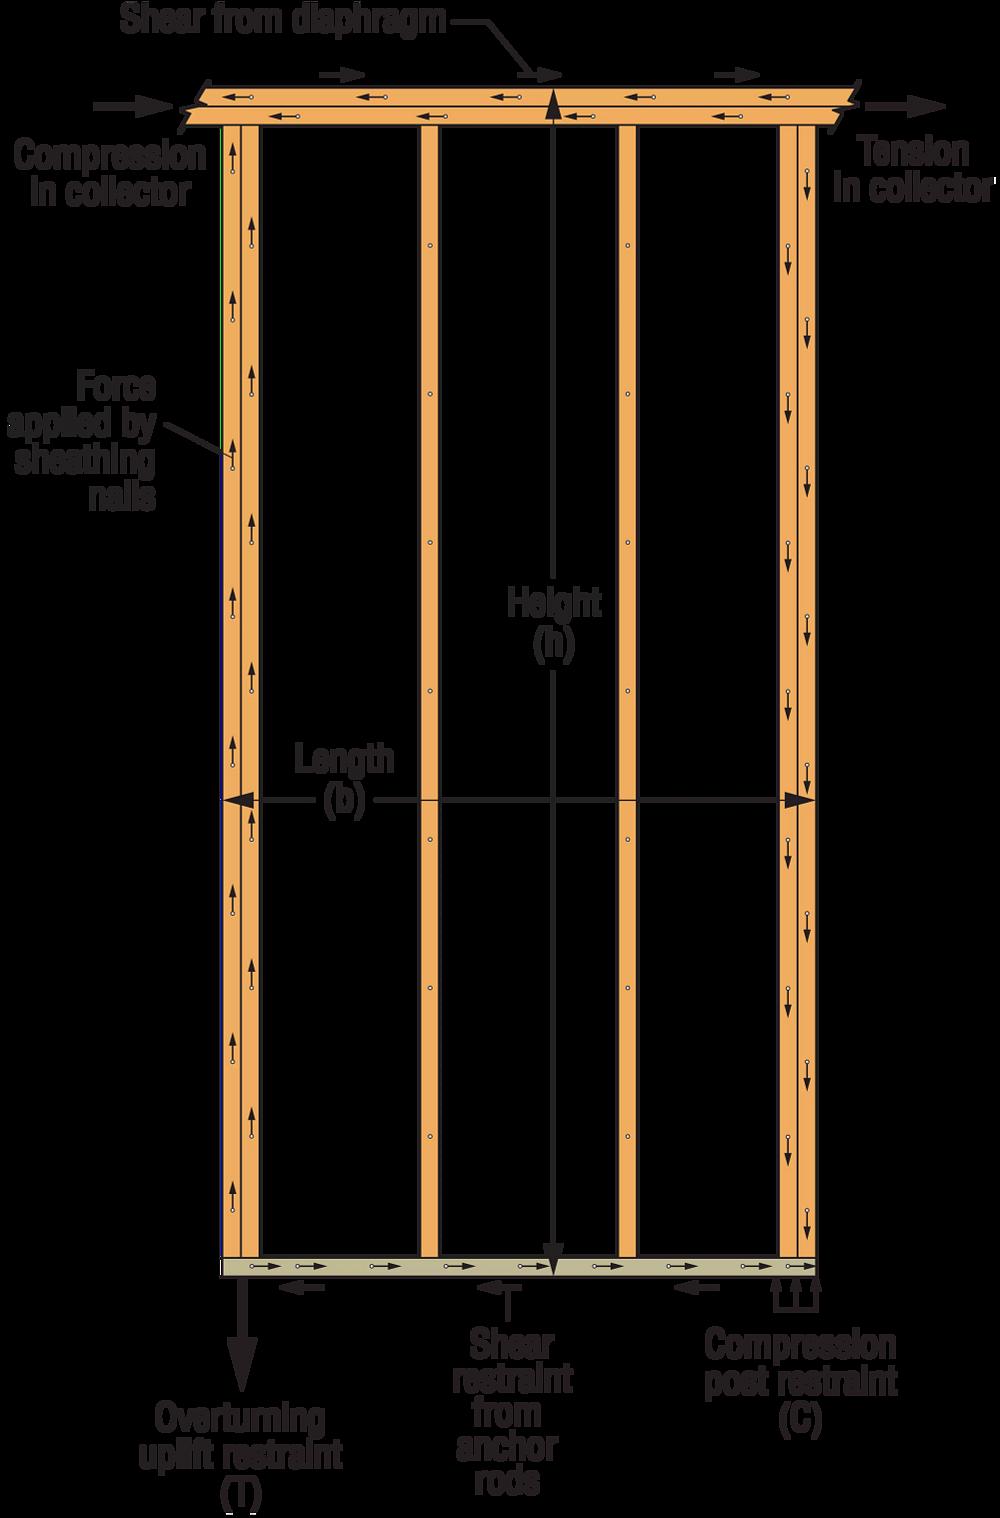 Idealized Force Diagram on Full-Height Shearwall Segment